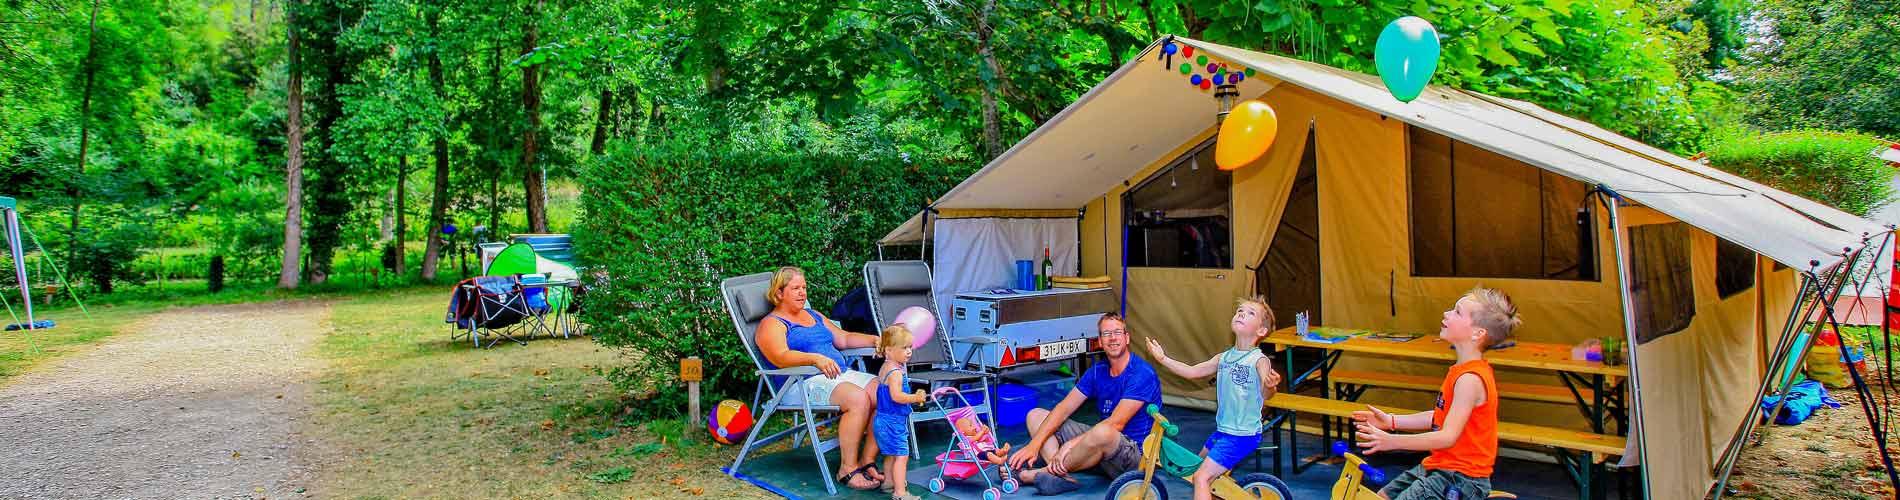 Tarifs camping dordogne tarifs des locations de vacances mobil home perigord for Camping dordogne avec piscine pas cher